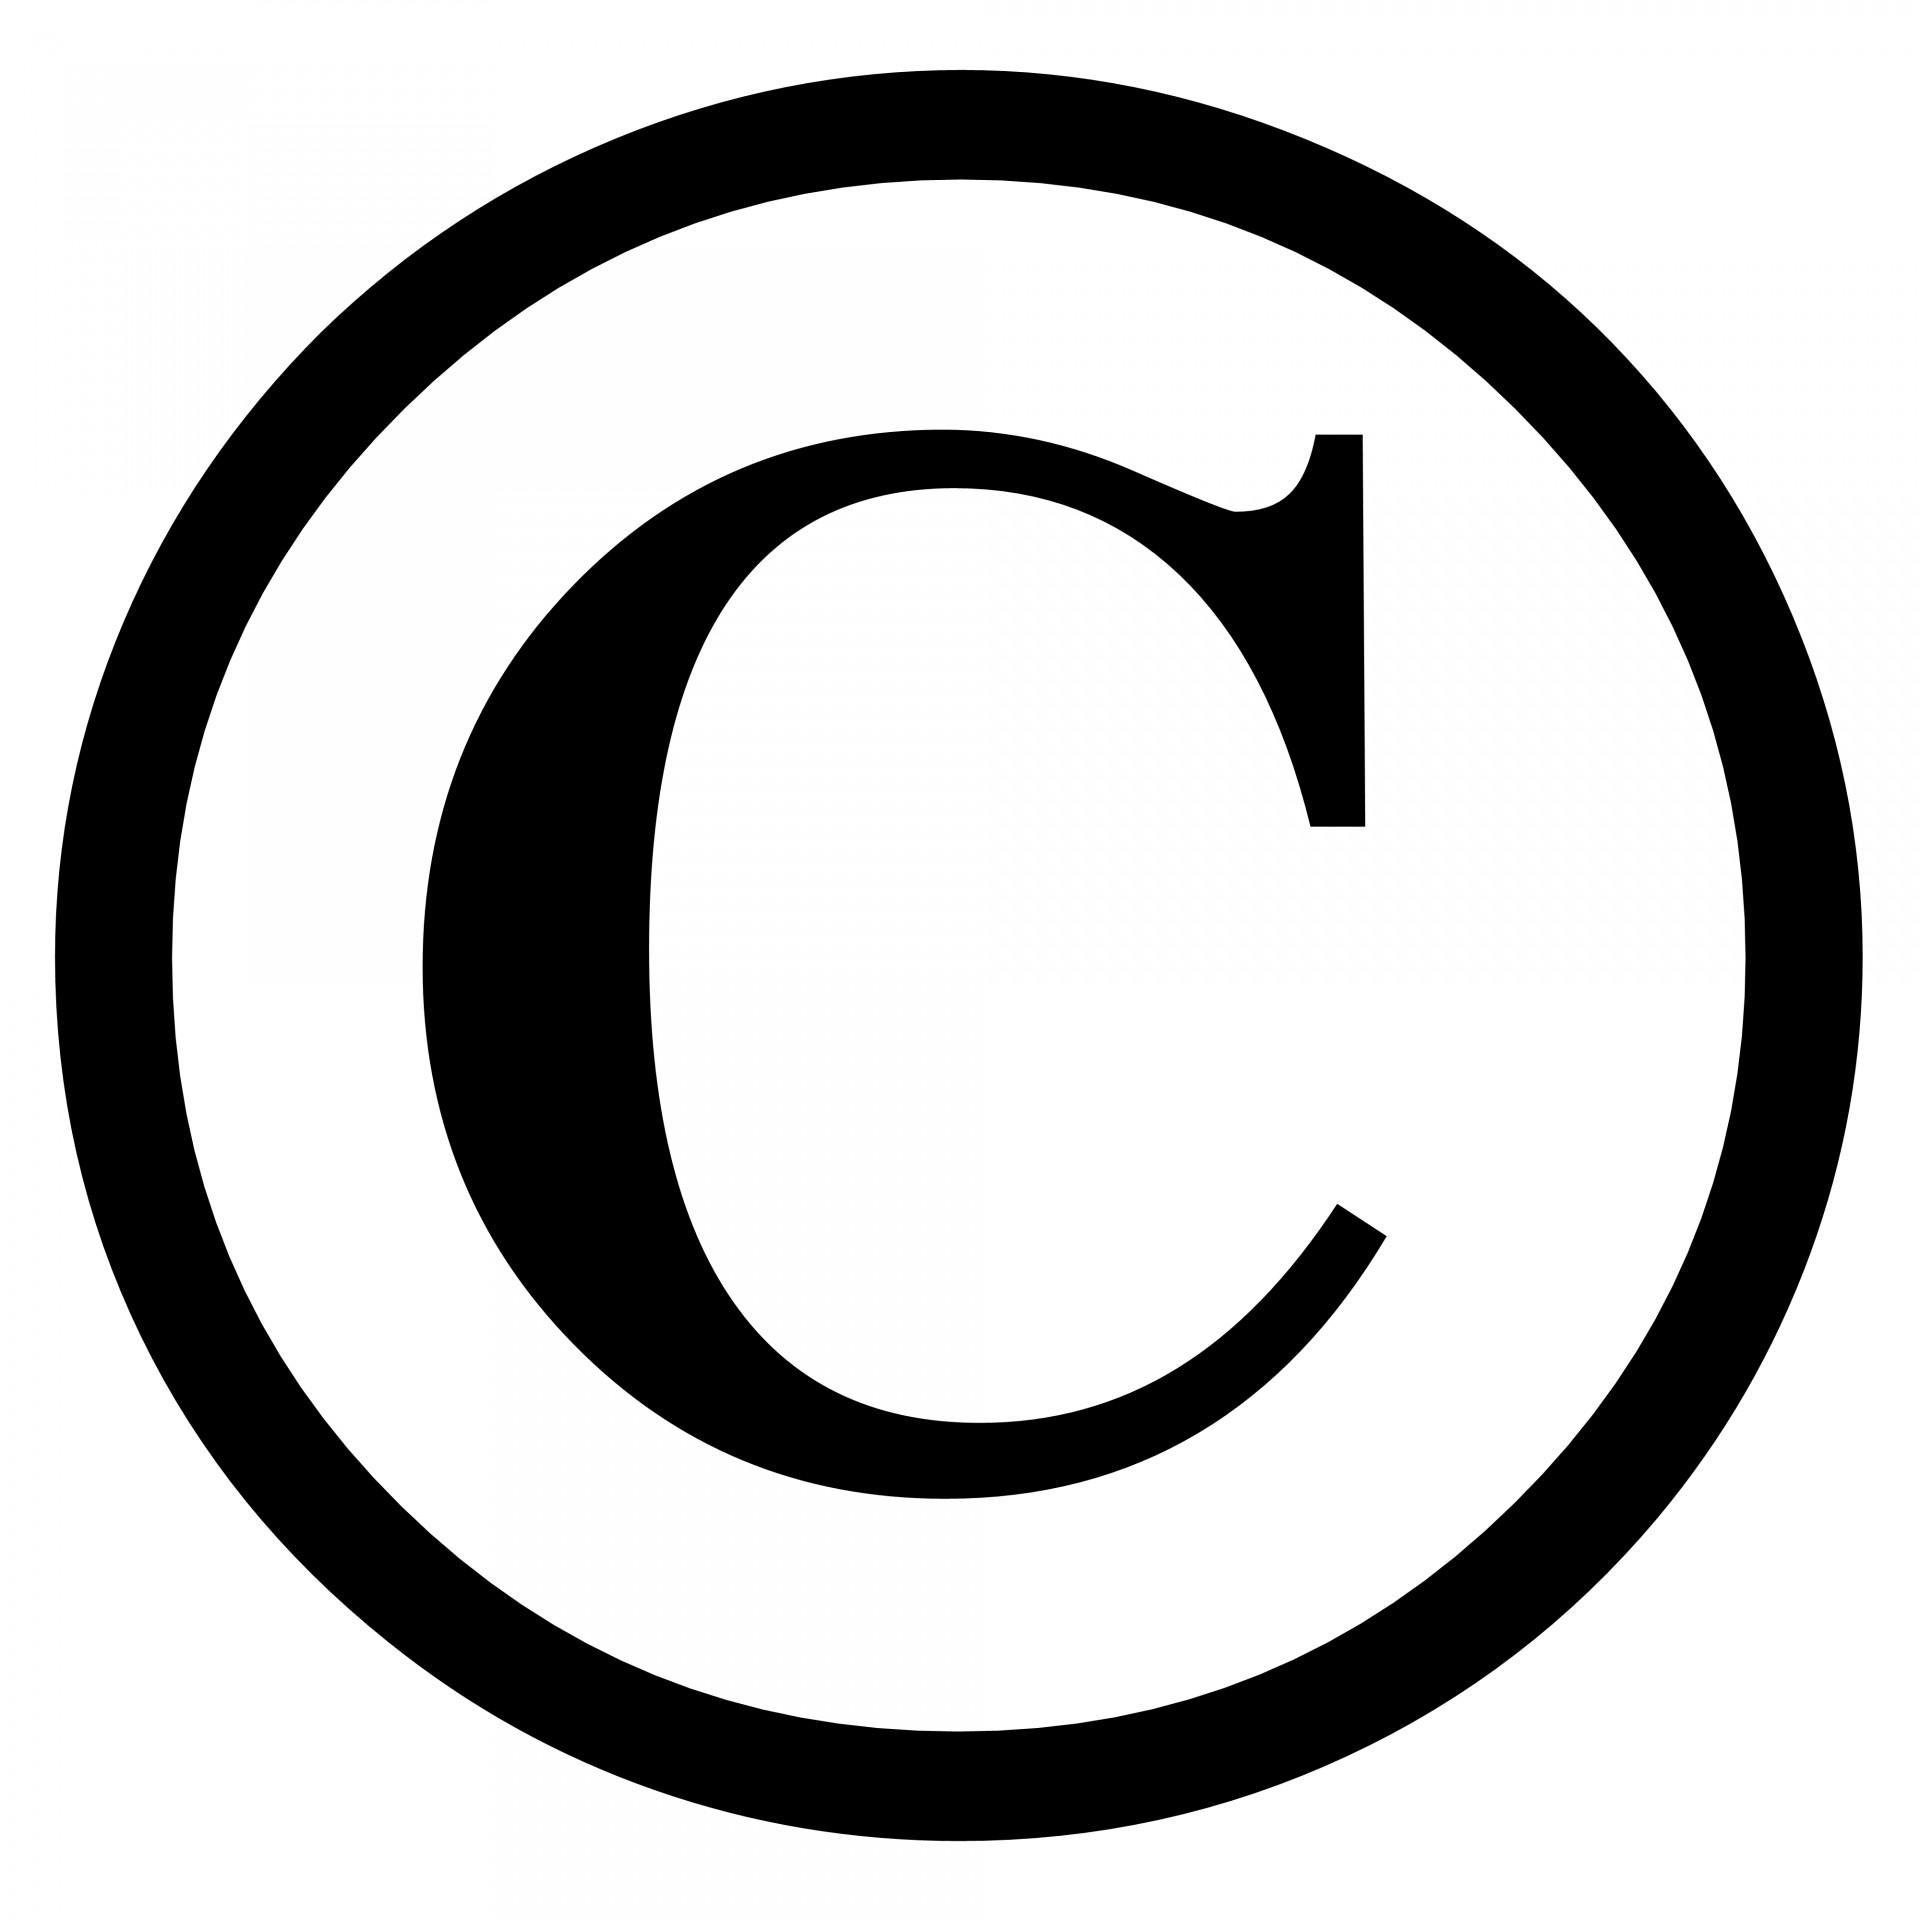 Copyrightnbspsymboliconsignagainstrecording Free Photo From